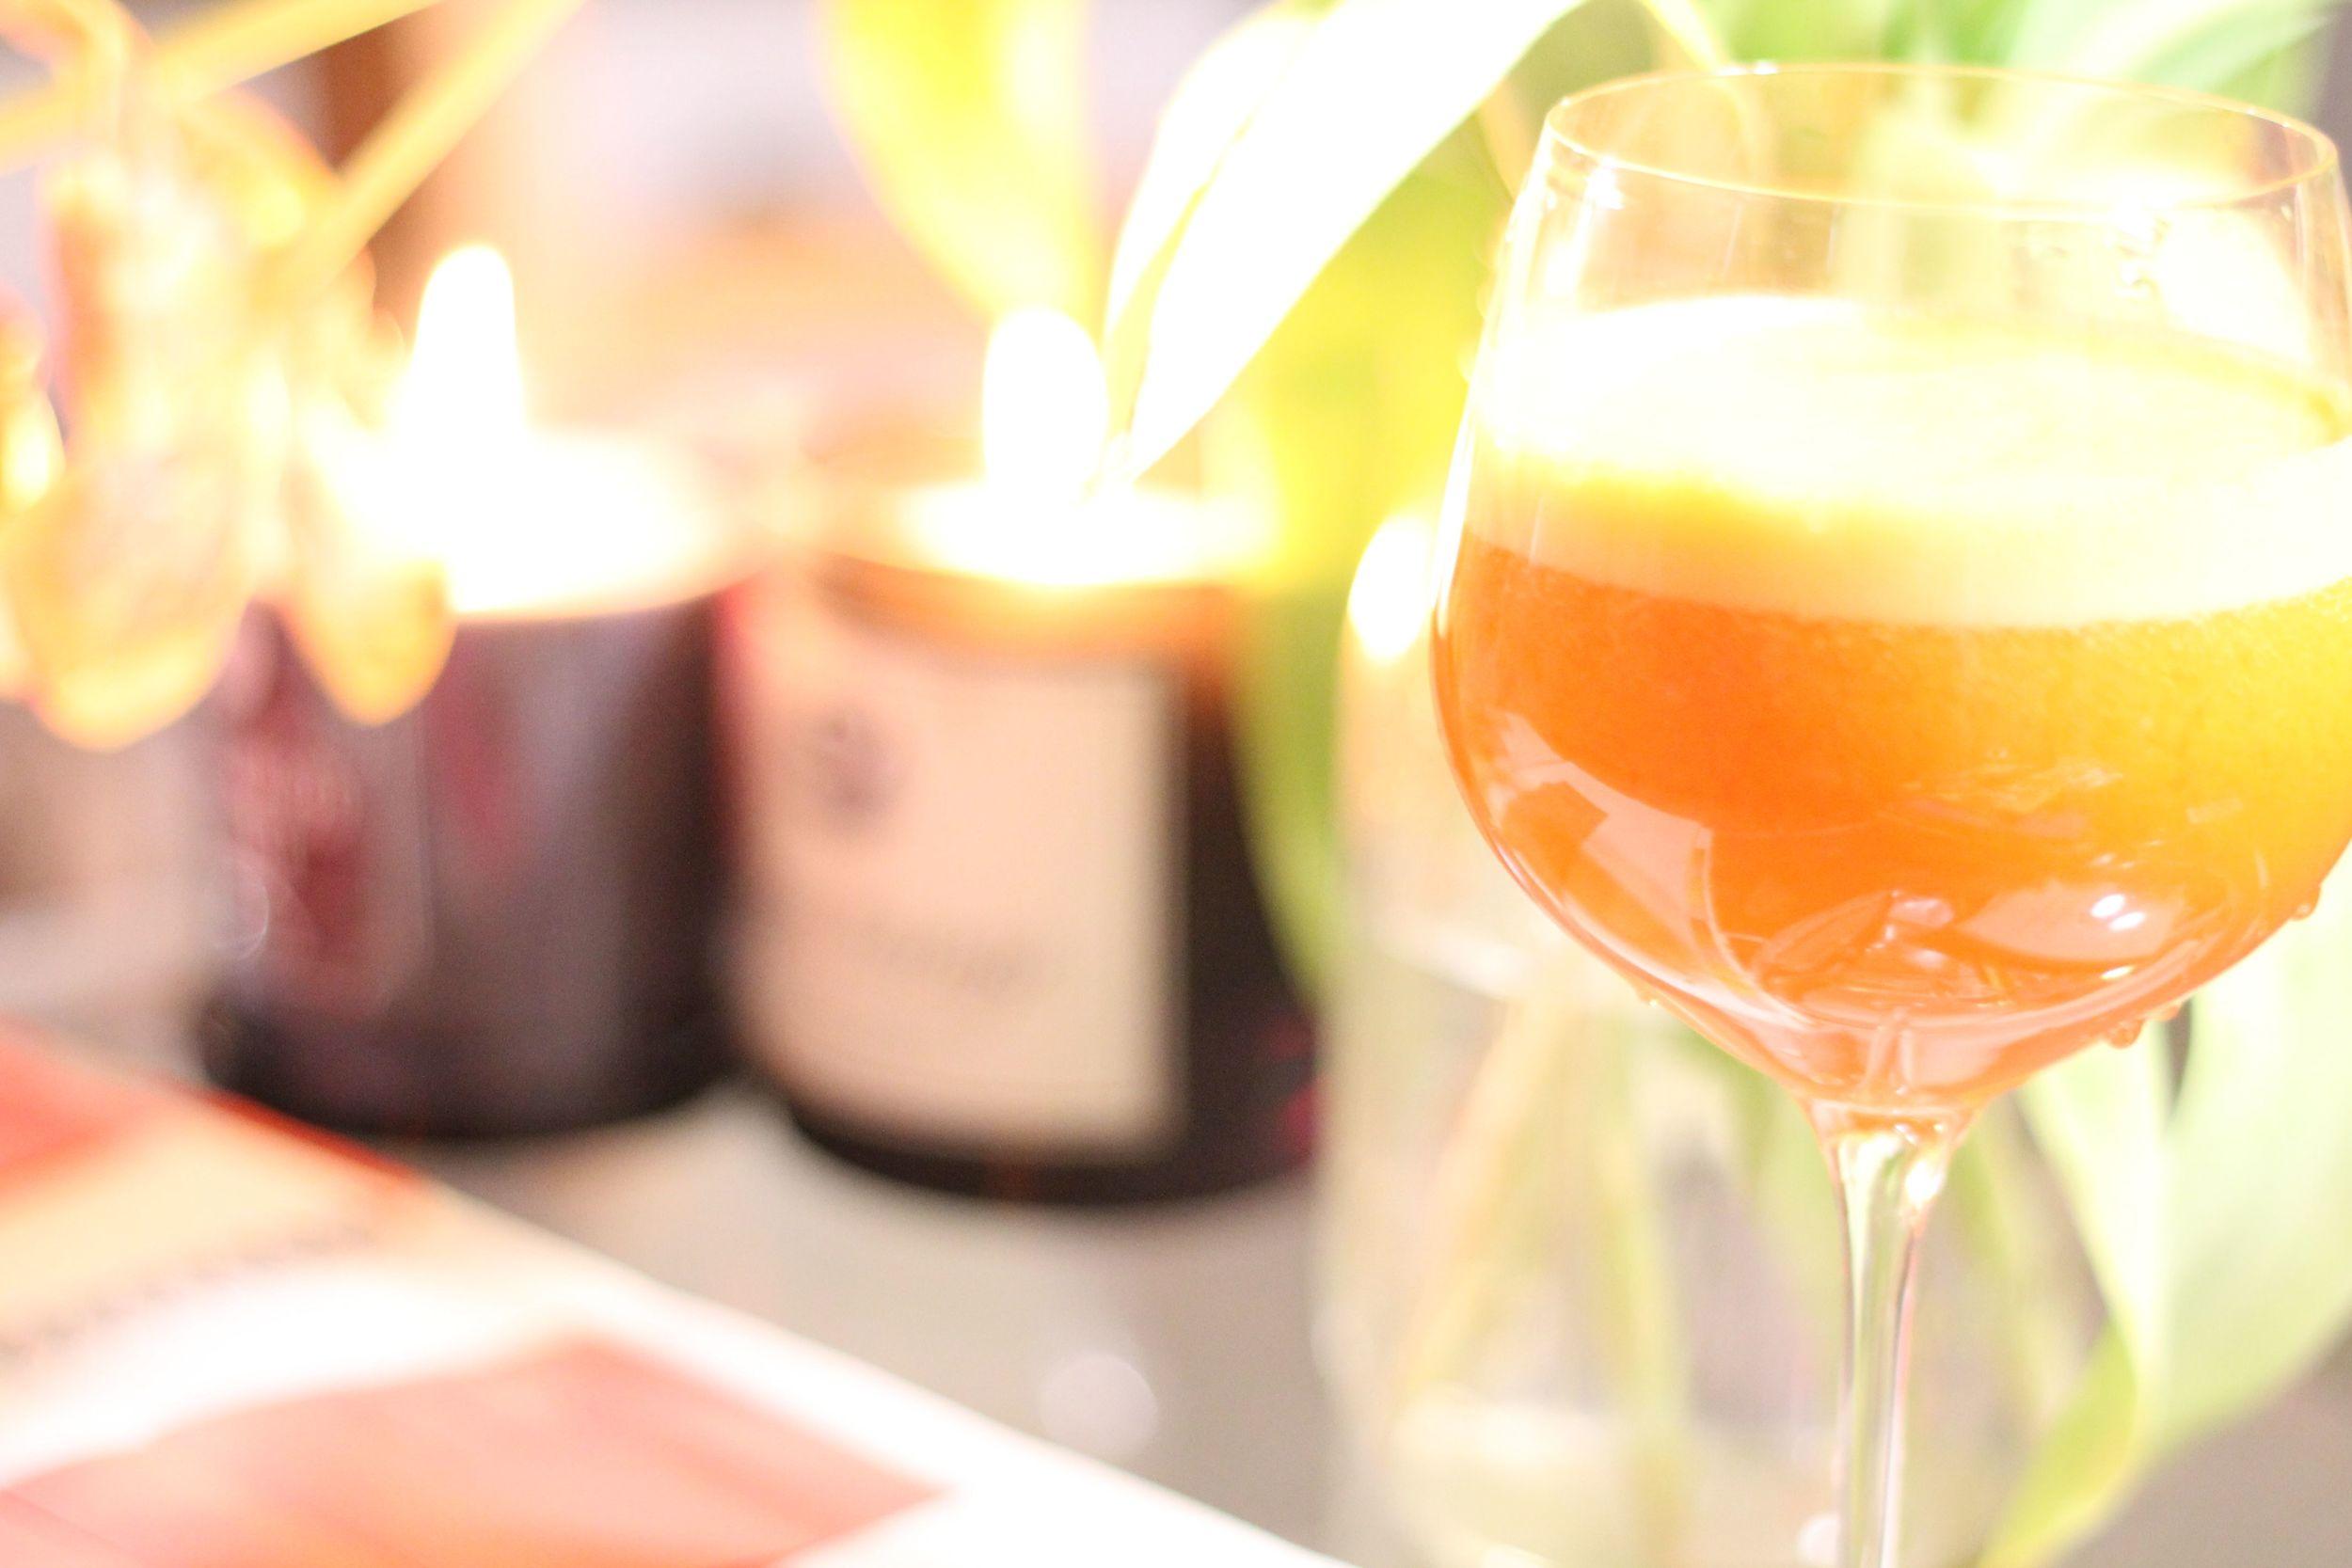 Delicious Energizing Orange Juice